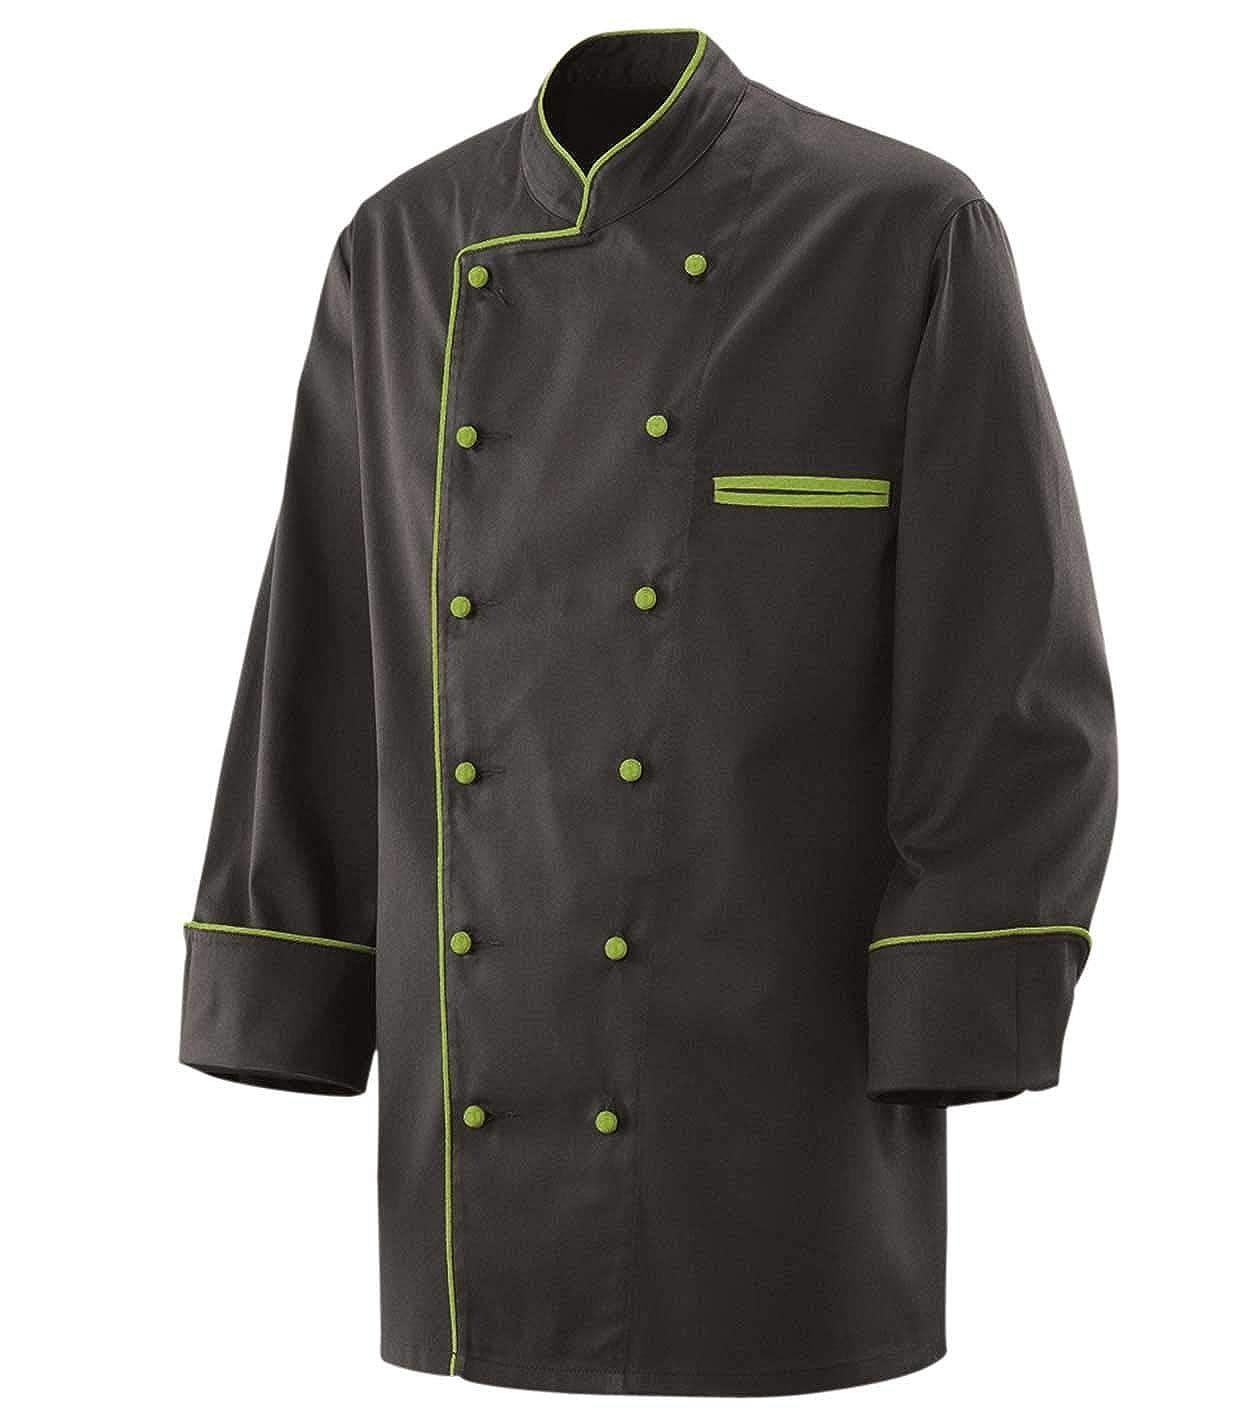 Giacca da cuoco con bordo a contrasto e bottoni